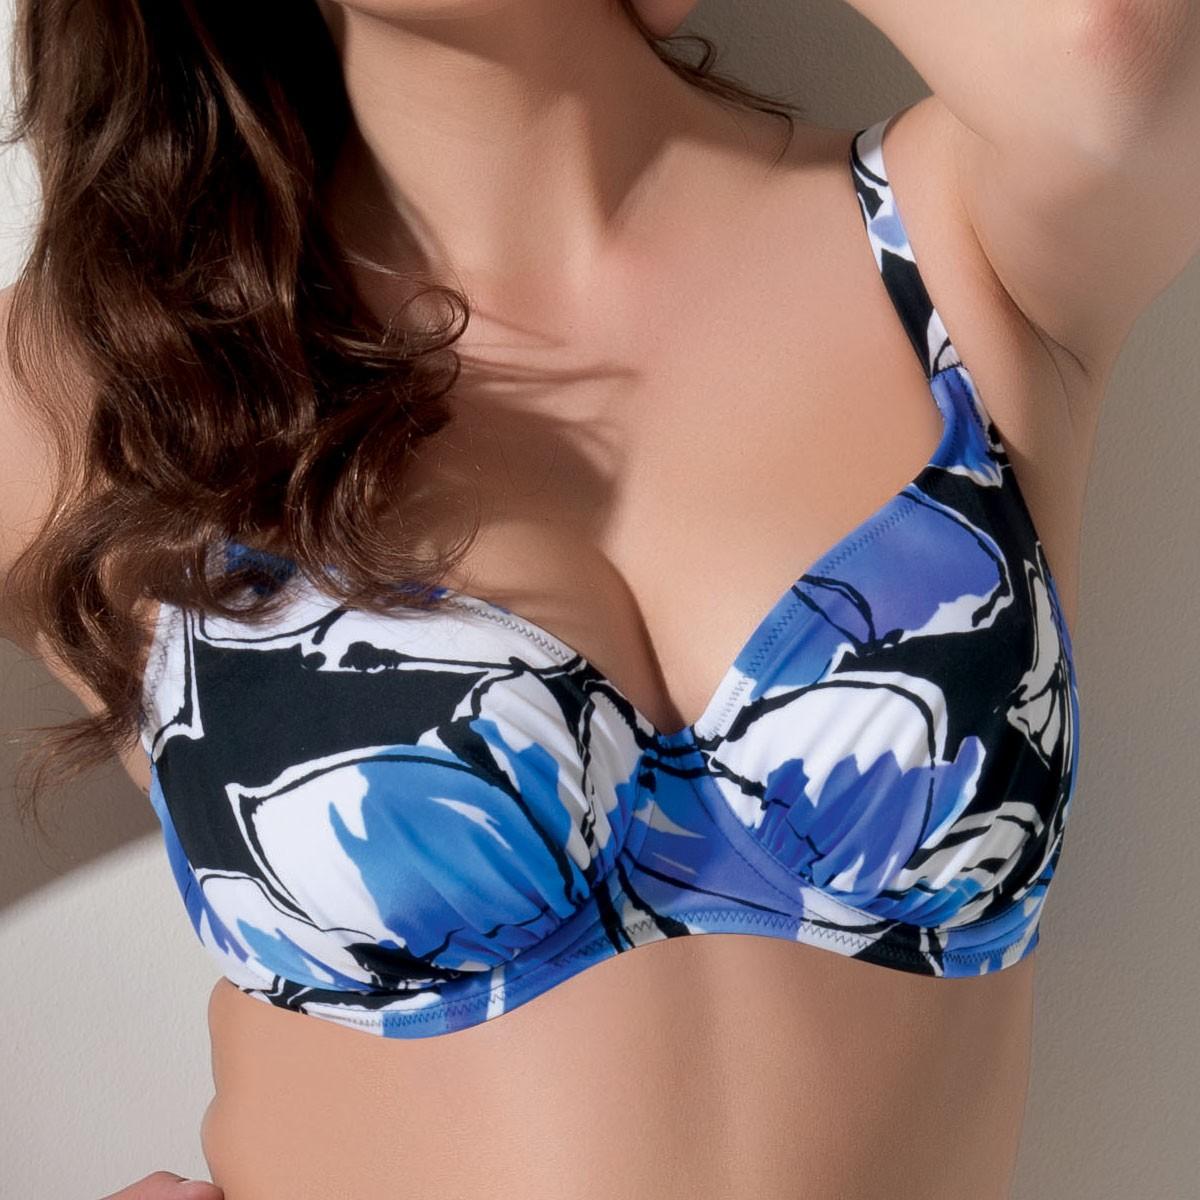 Fantasie Valetta Full Cup Bikini Top - Persian Blue